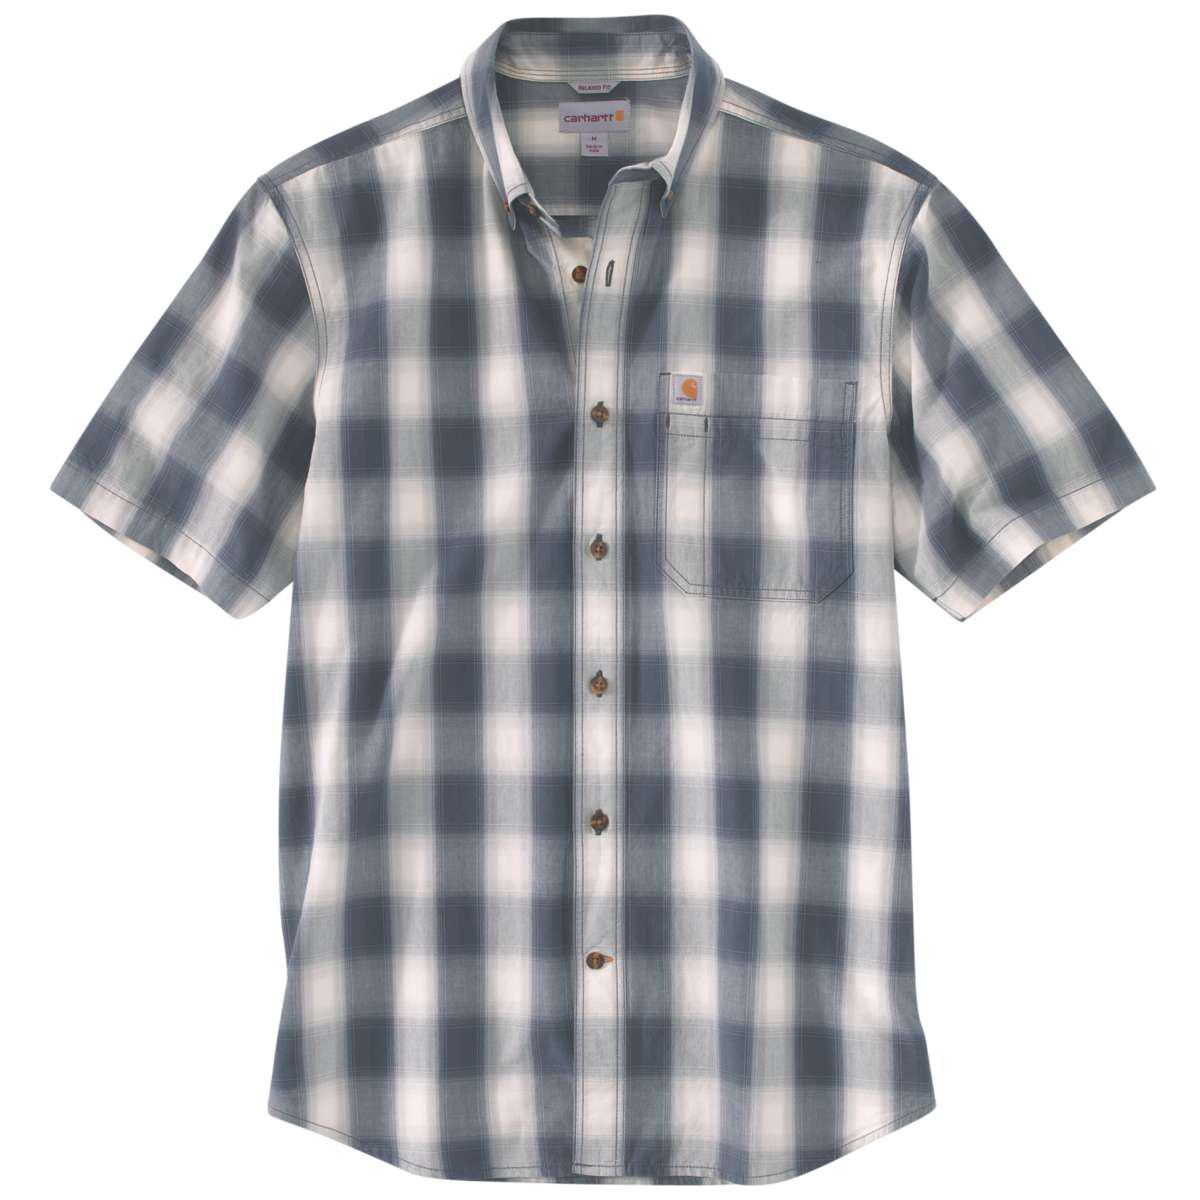 Carhartt Men's Essential Plaid Button Down Short-Sleeve Shirt - Blue, XL